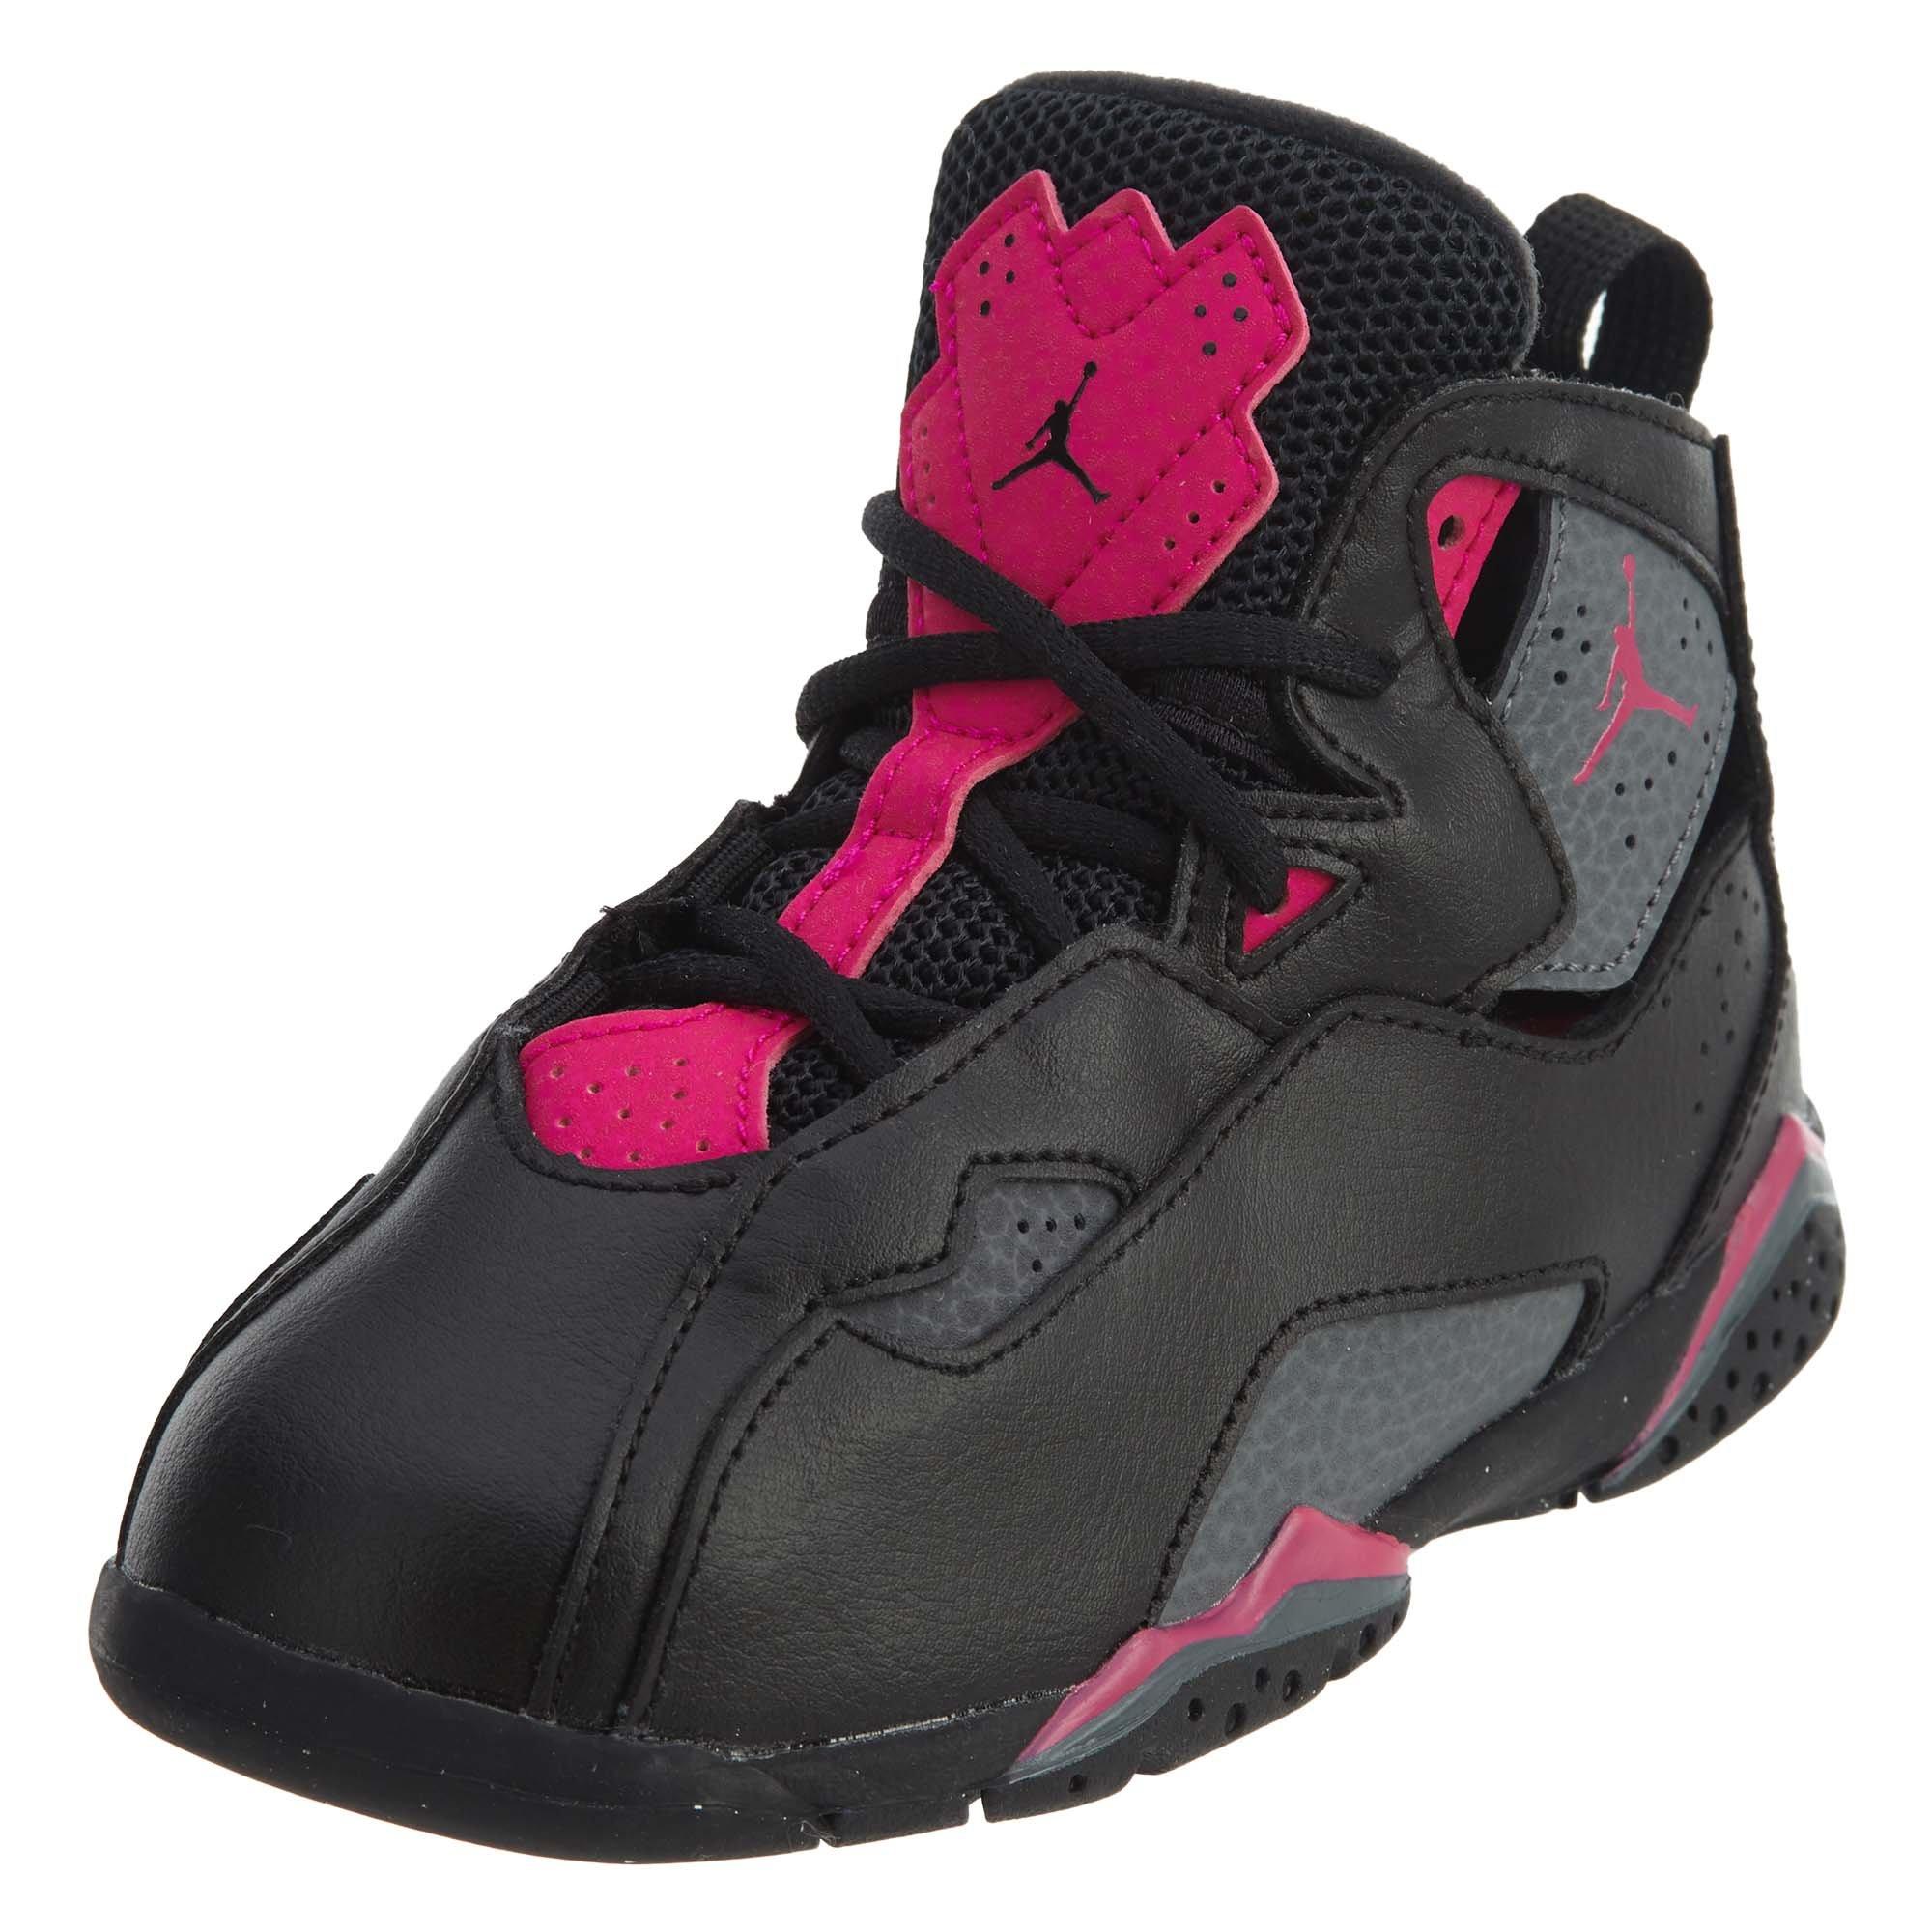 Jordan Nike Toddlers True Flight GT Black/Dark/Grey/Deadly/Pink Basketball Shoe 10 Infants US